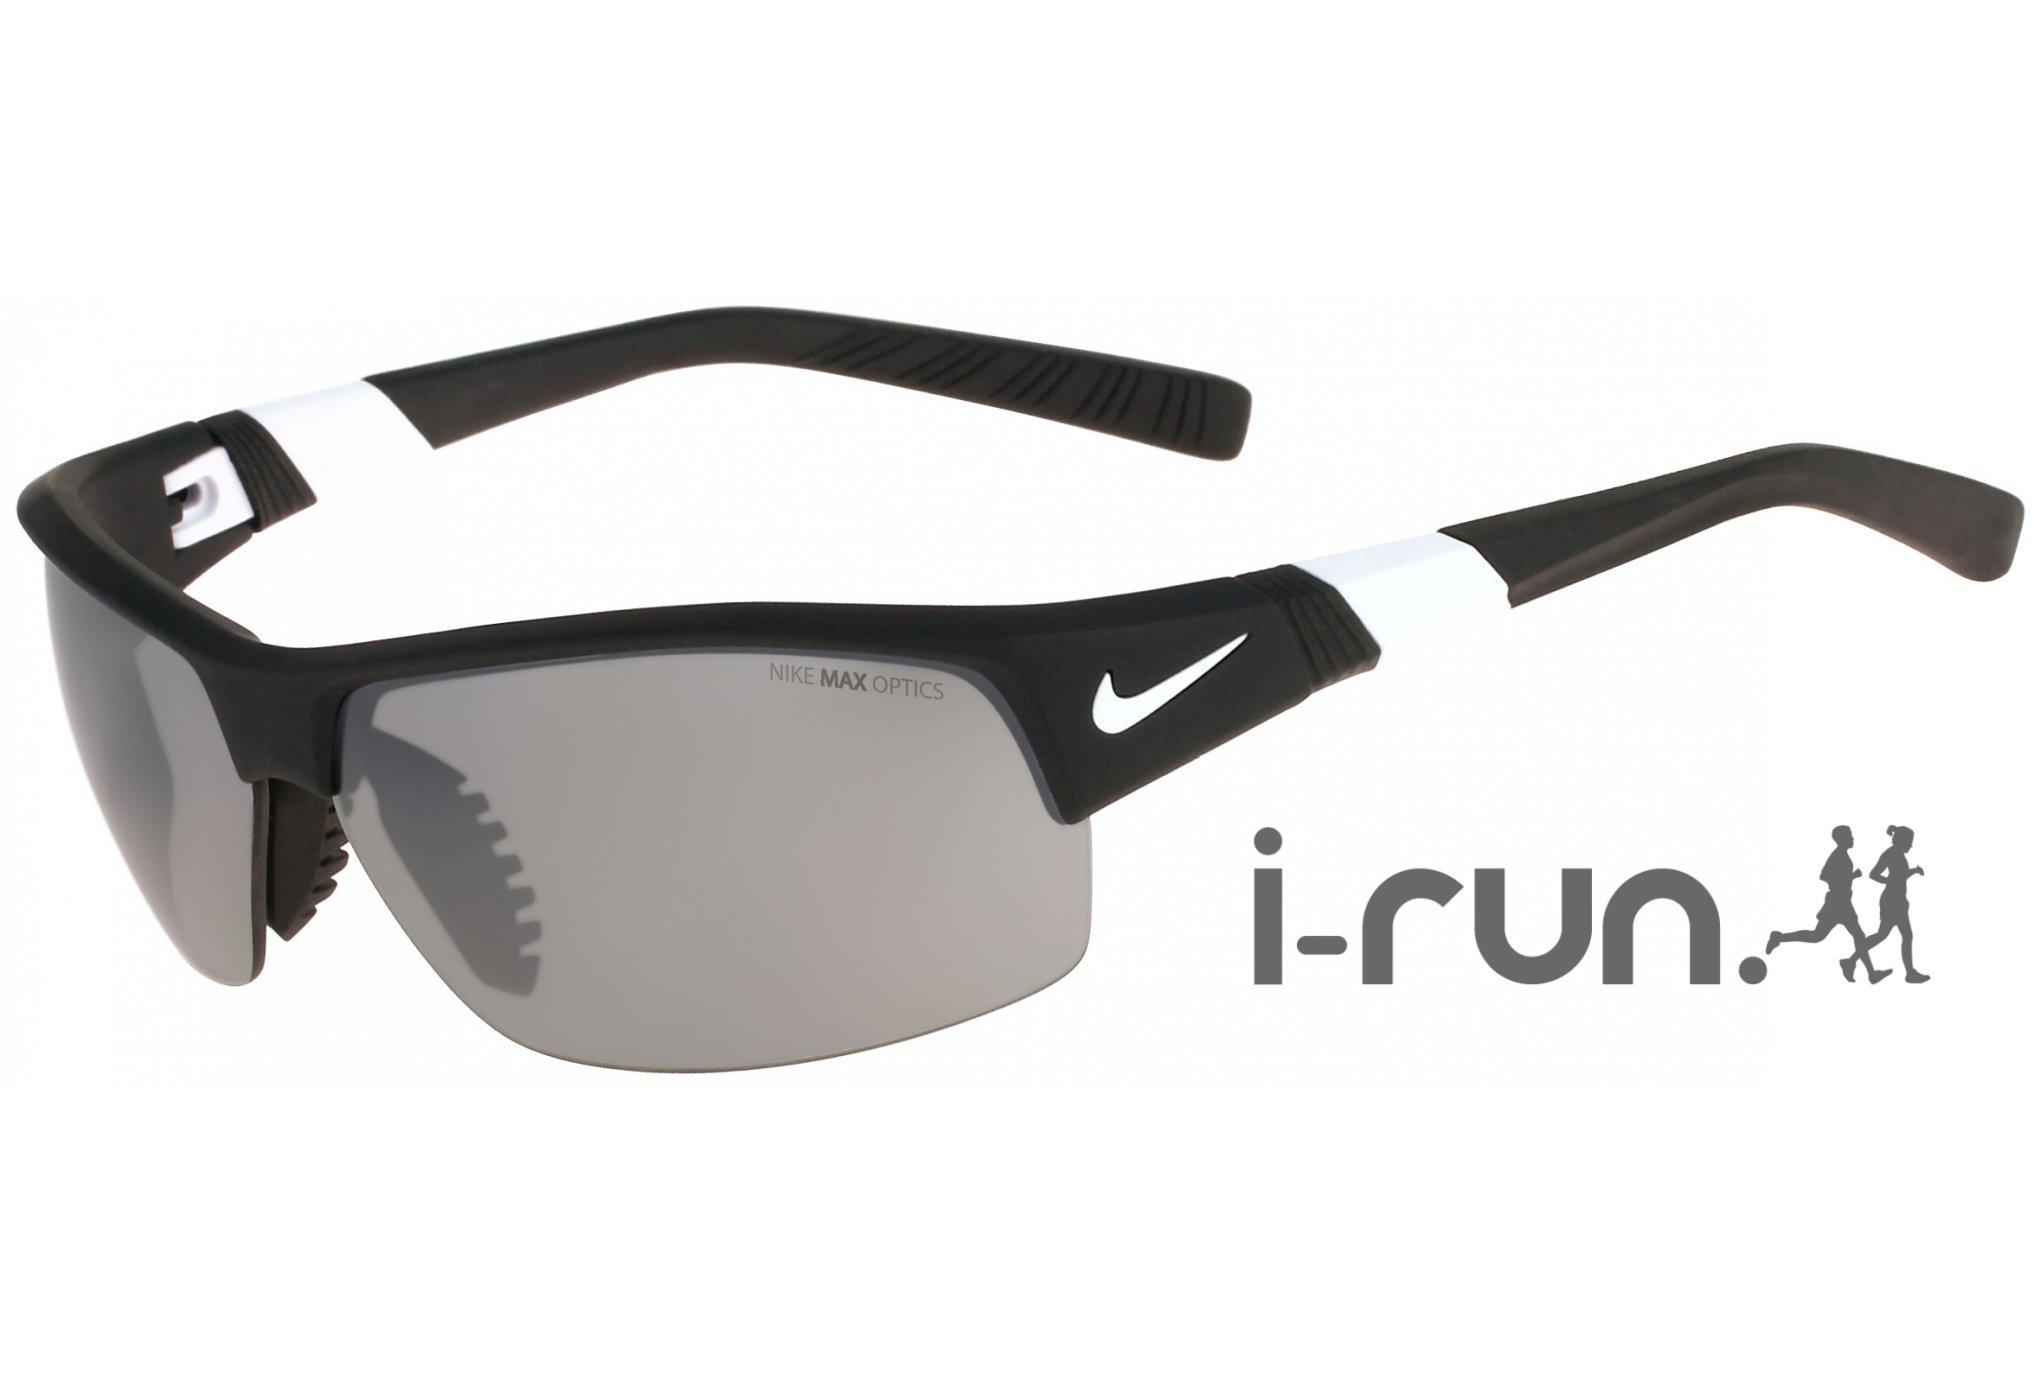 Nike Lunettes Show X2 Lunettes